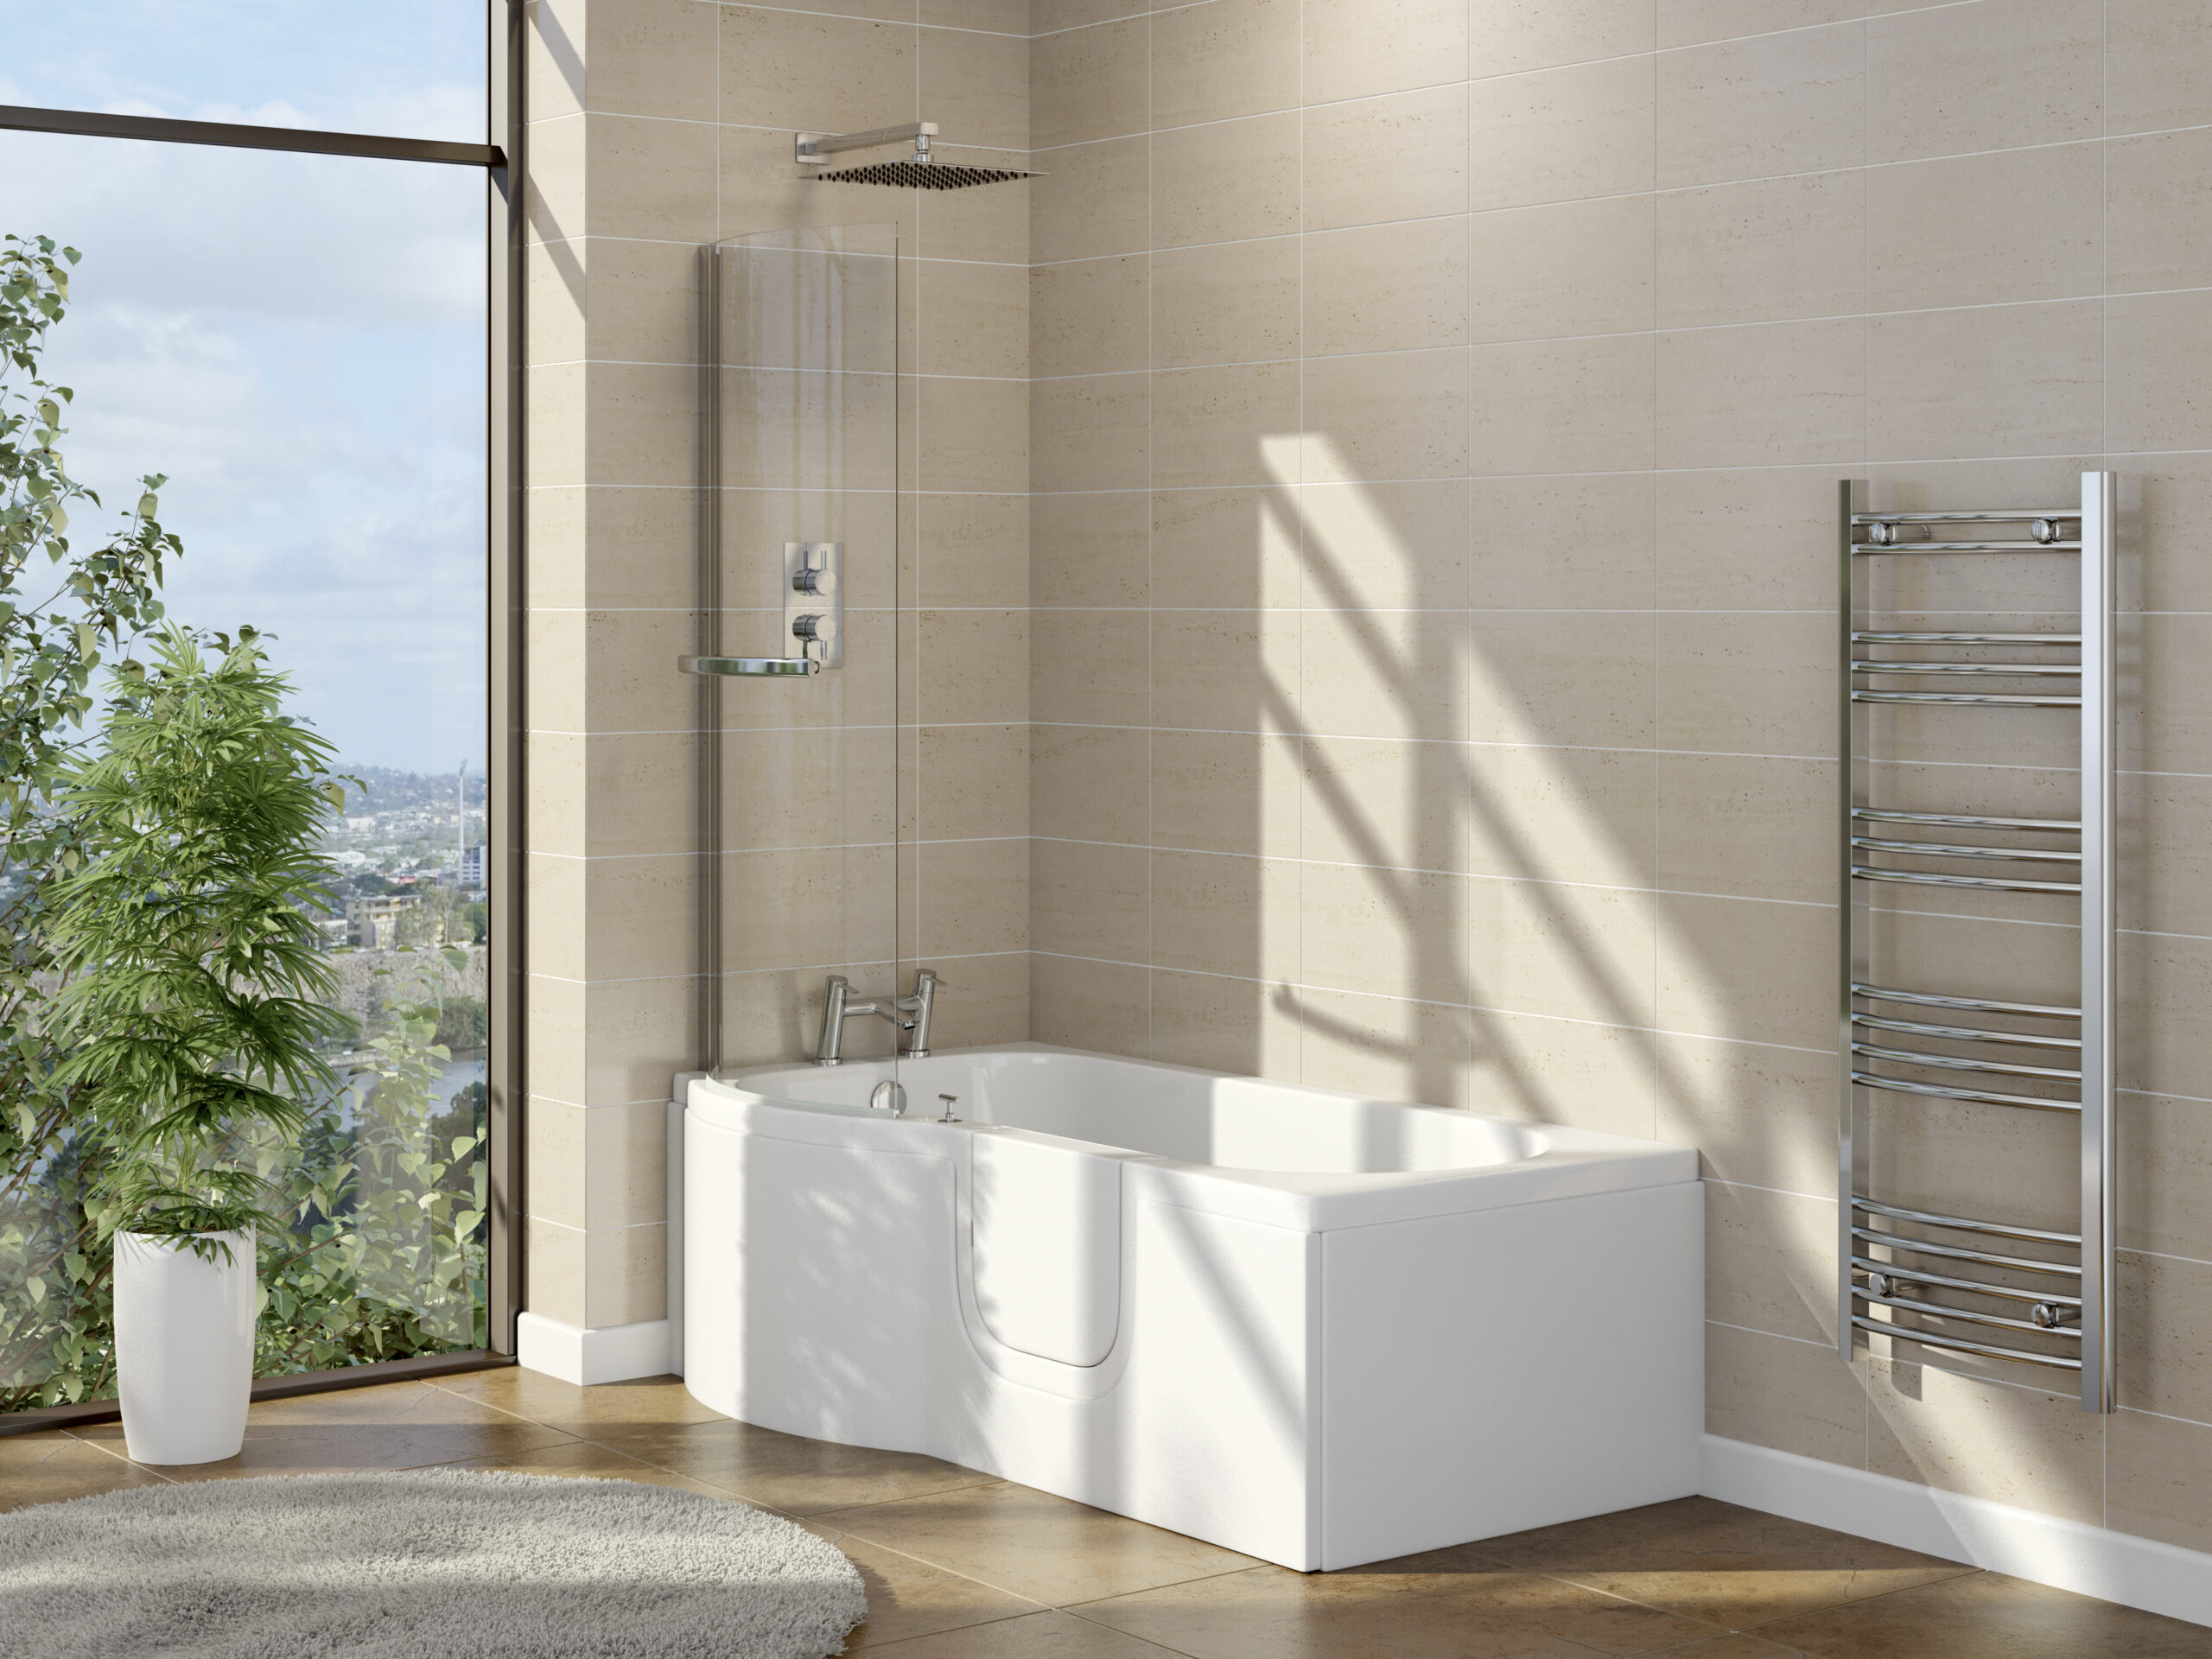 Calypso Shower Bath Roomset